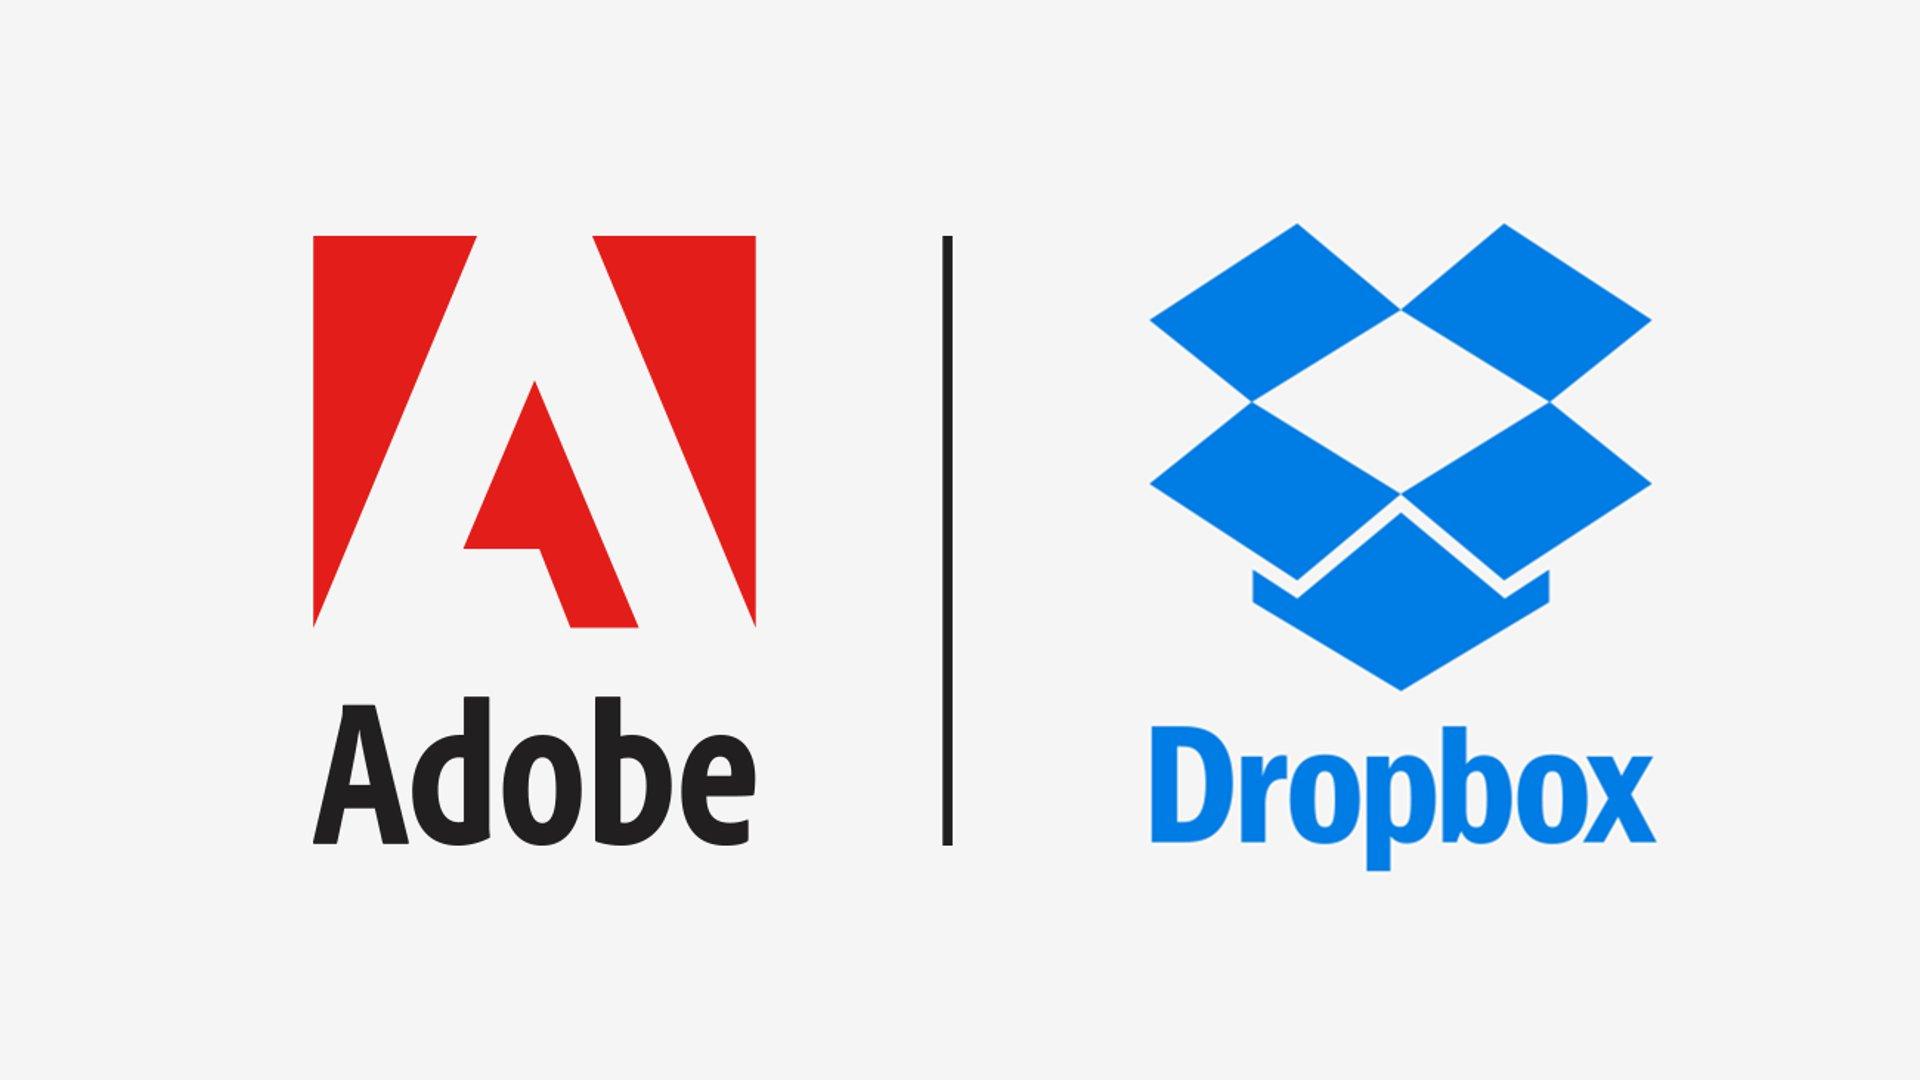 Adobe - Dropbox